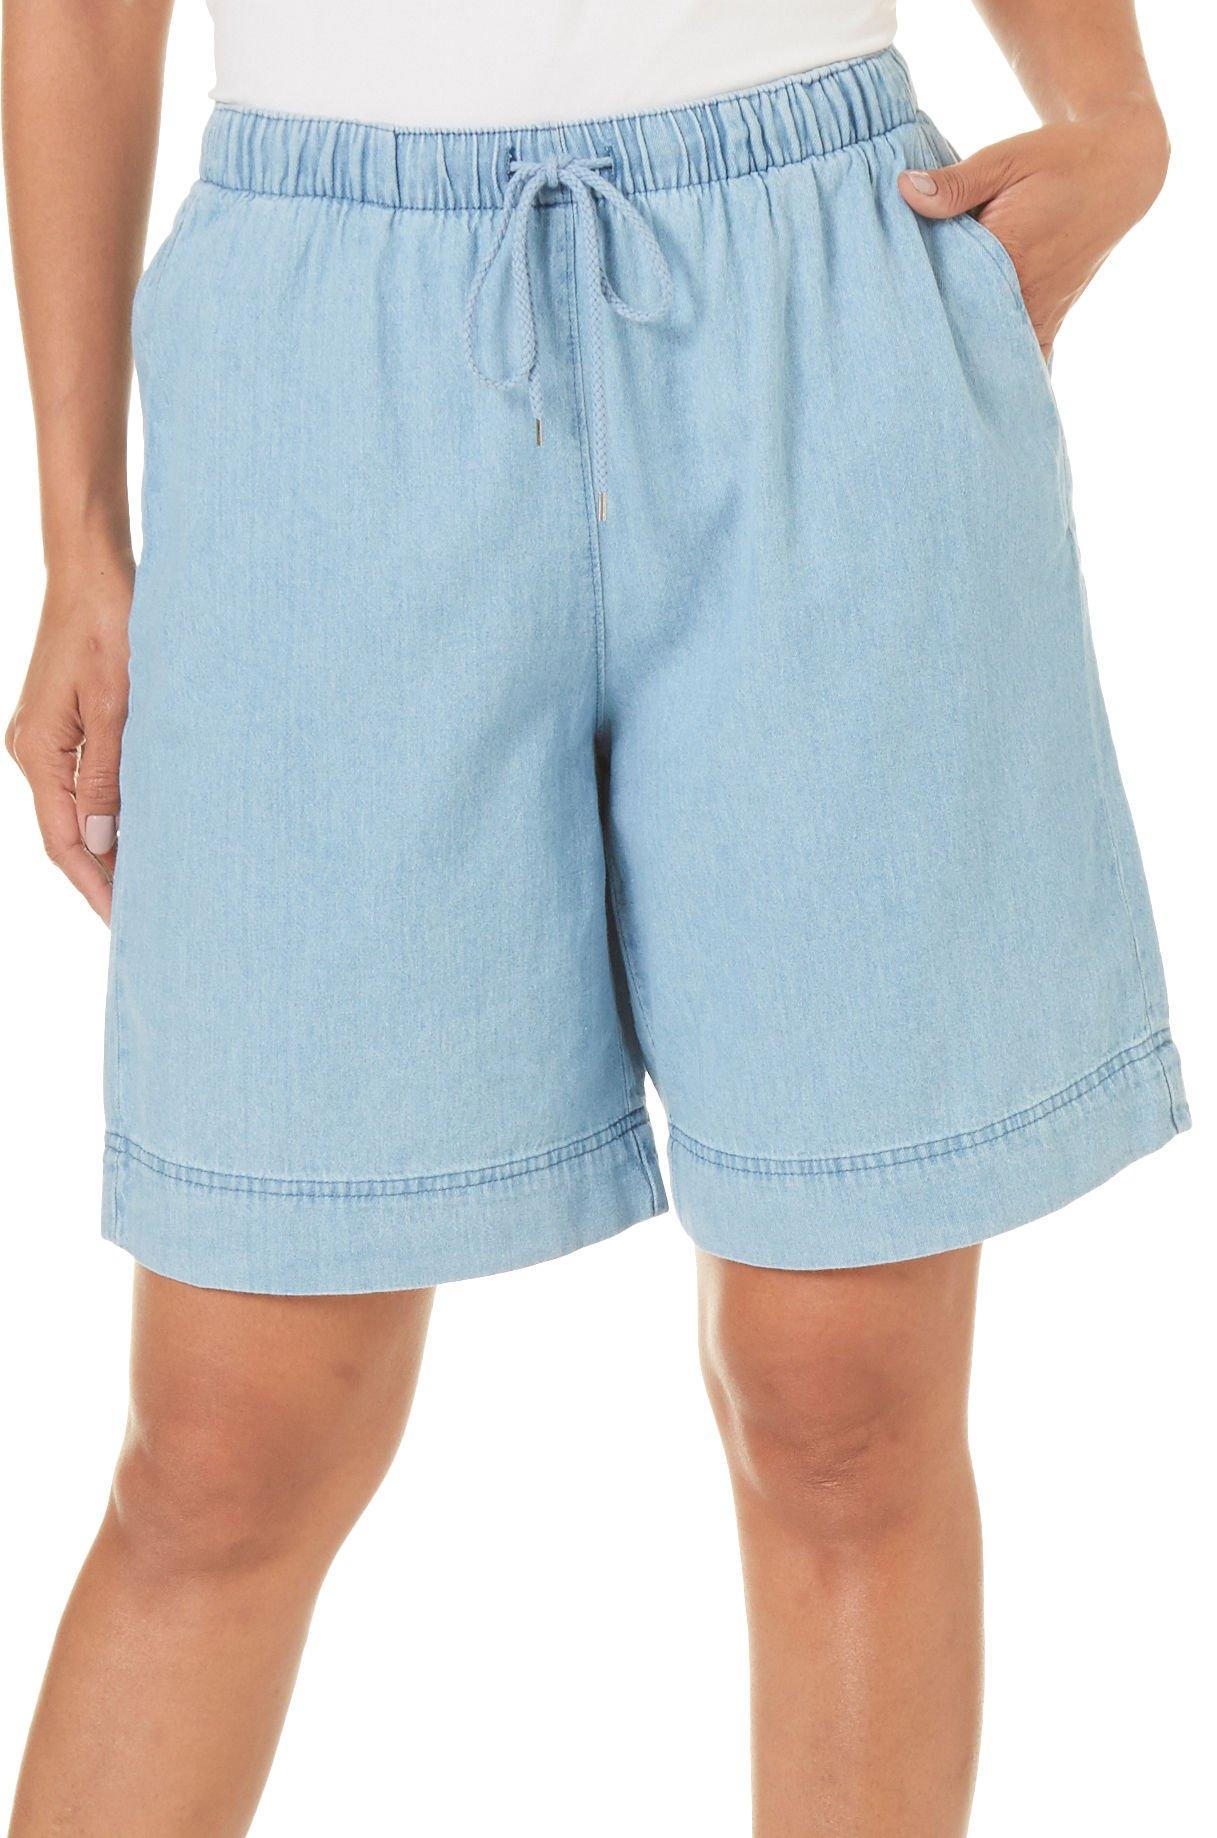 Coral Bay Womens Pull On Denim Bermuda Shorts Small Lighter Denim